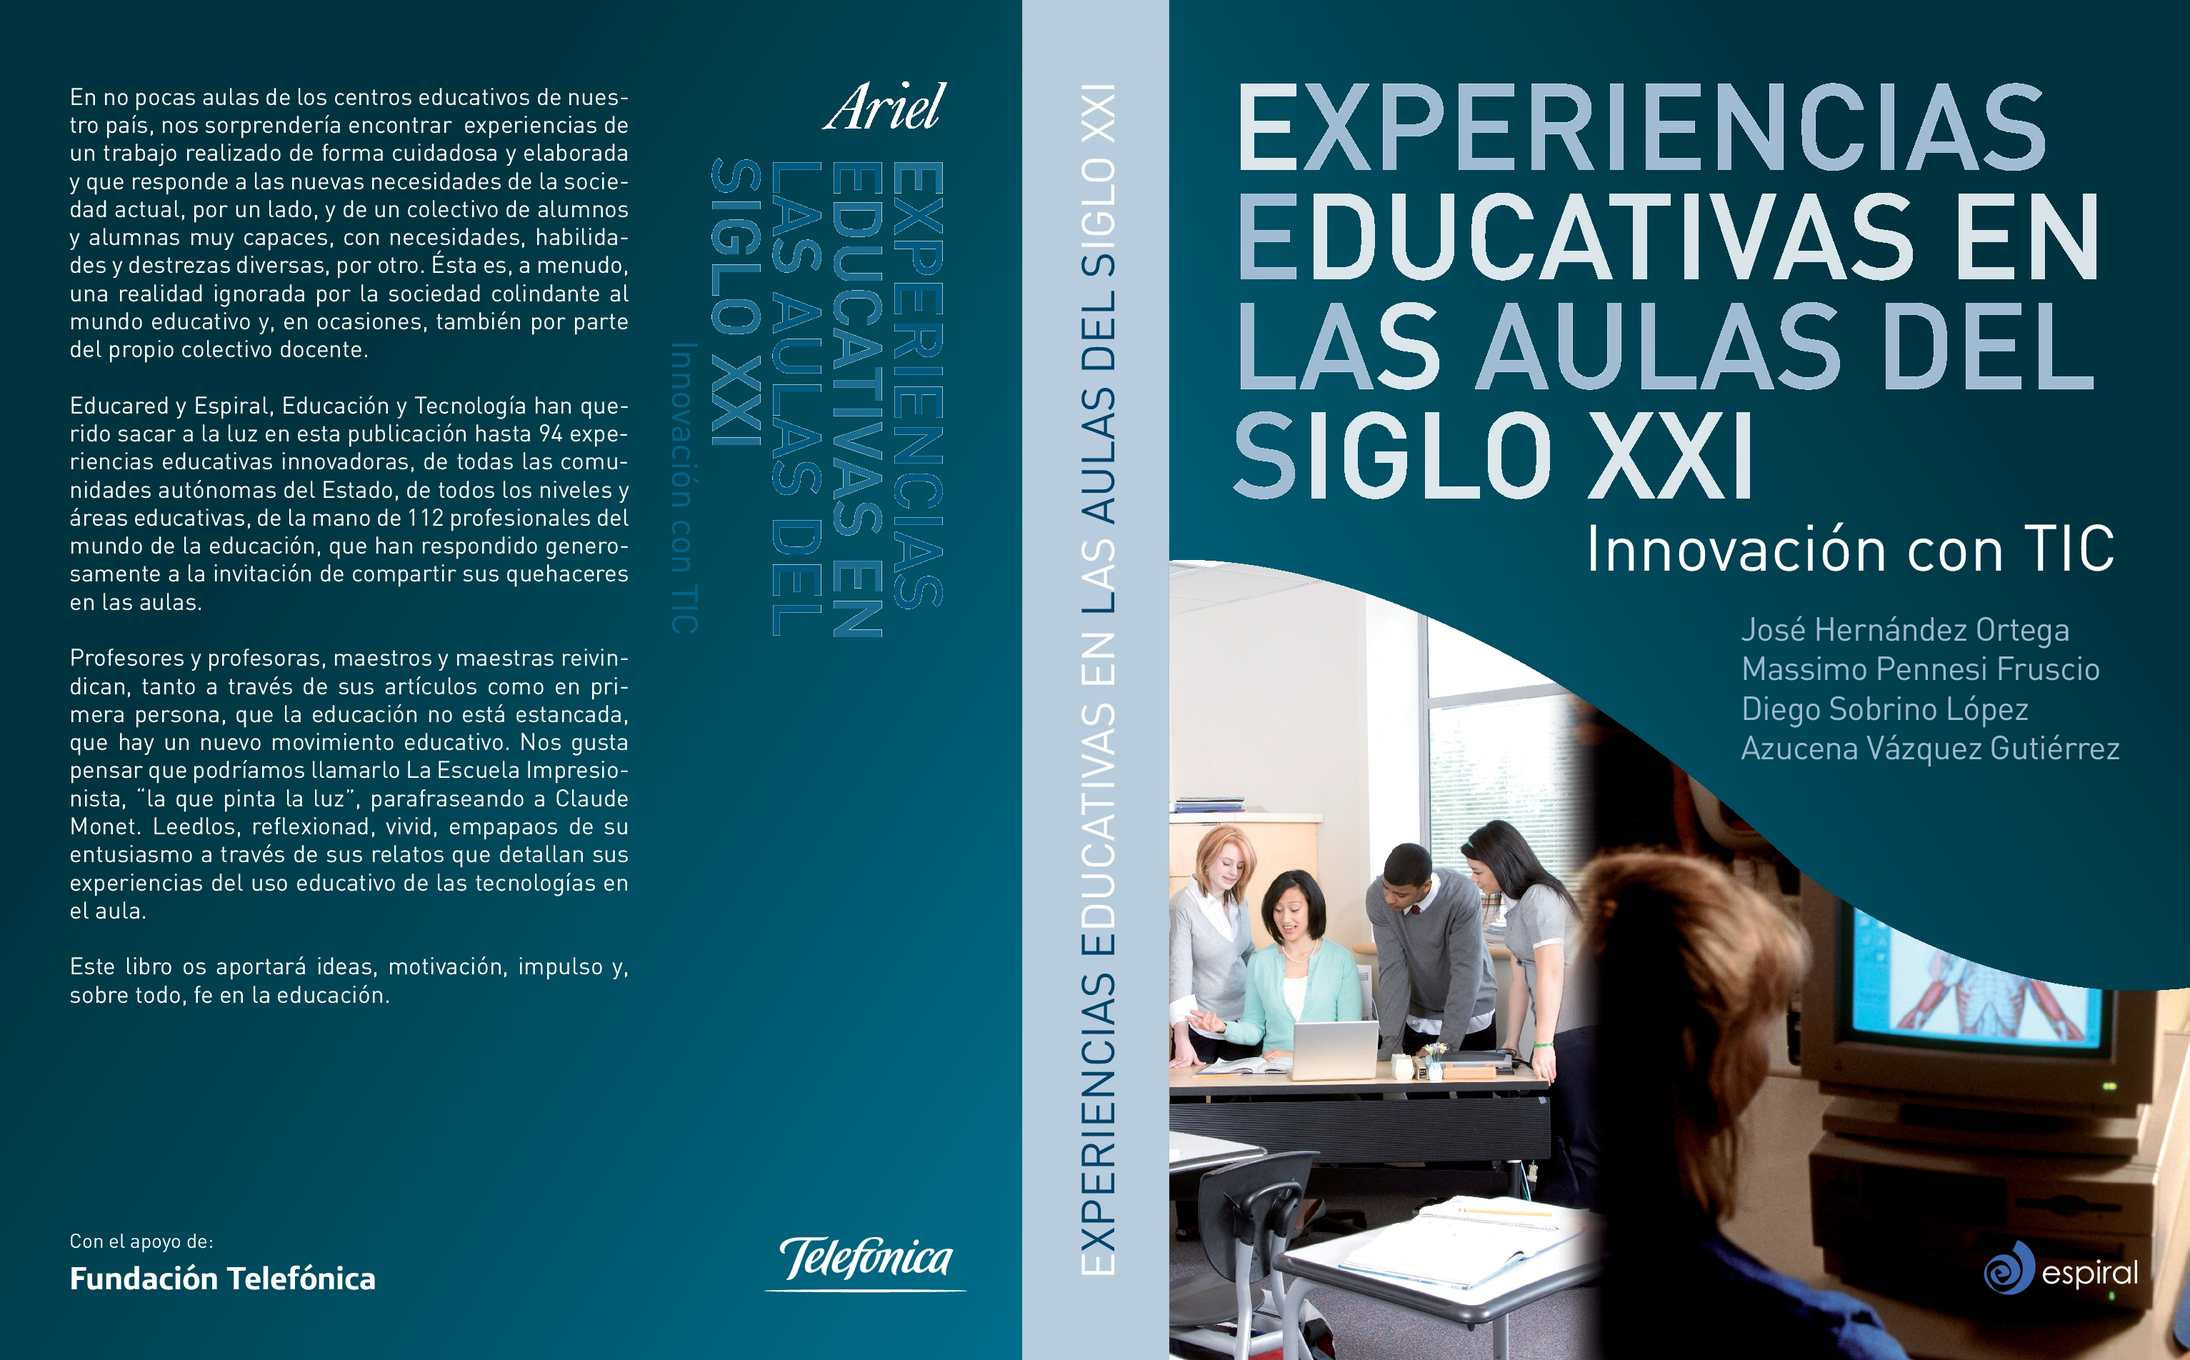 Calaméo - 225 Experiencias Educativas20 f088b8bf1ed